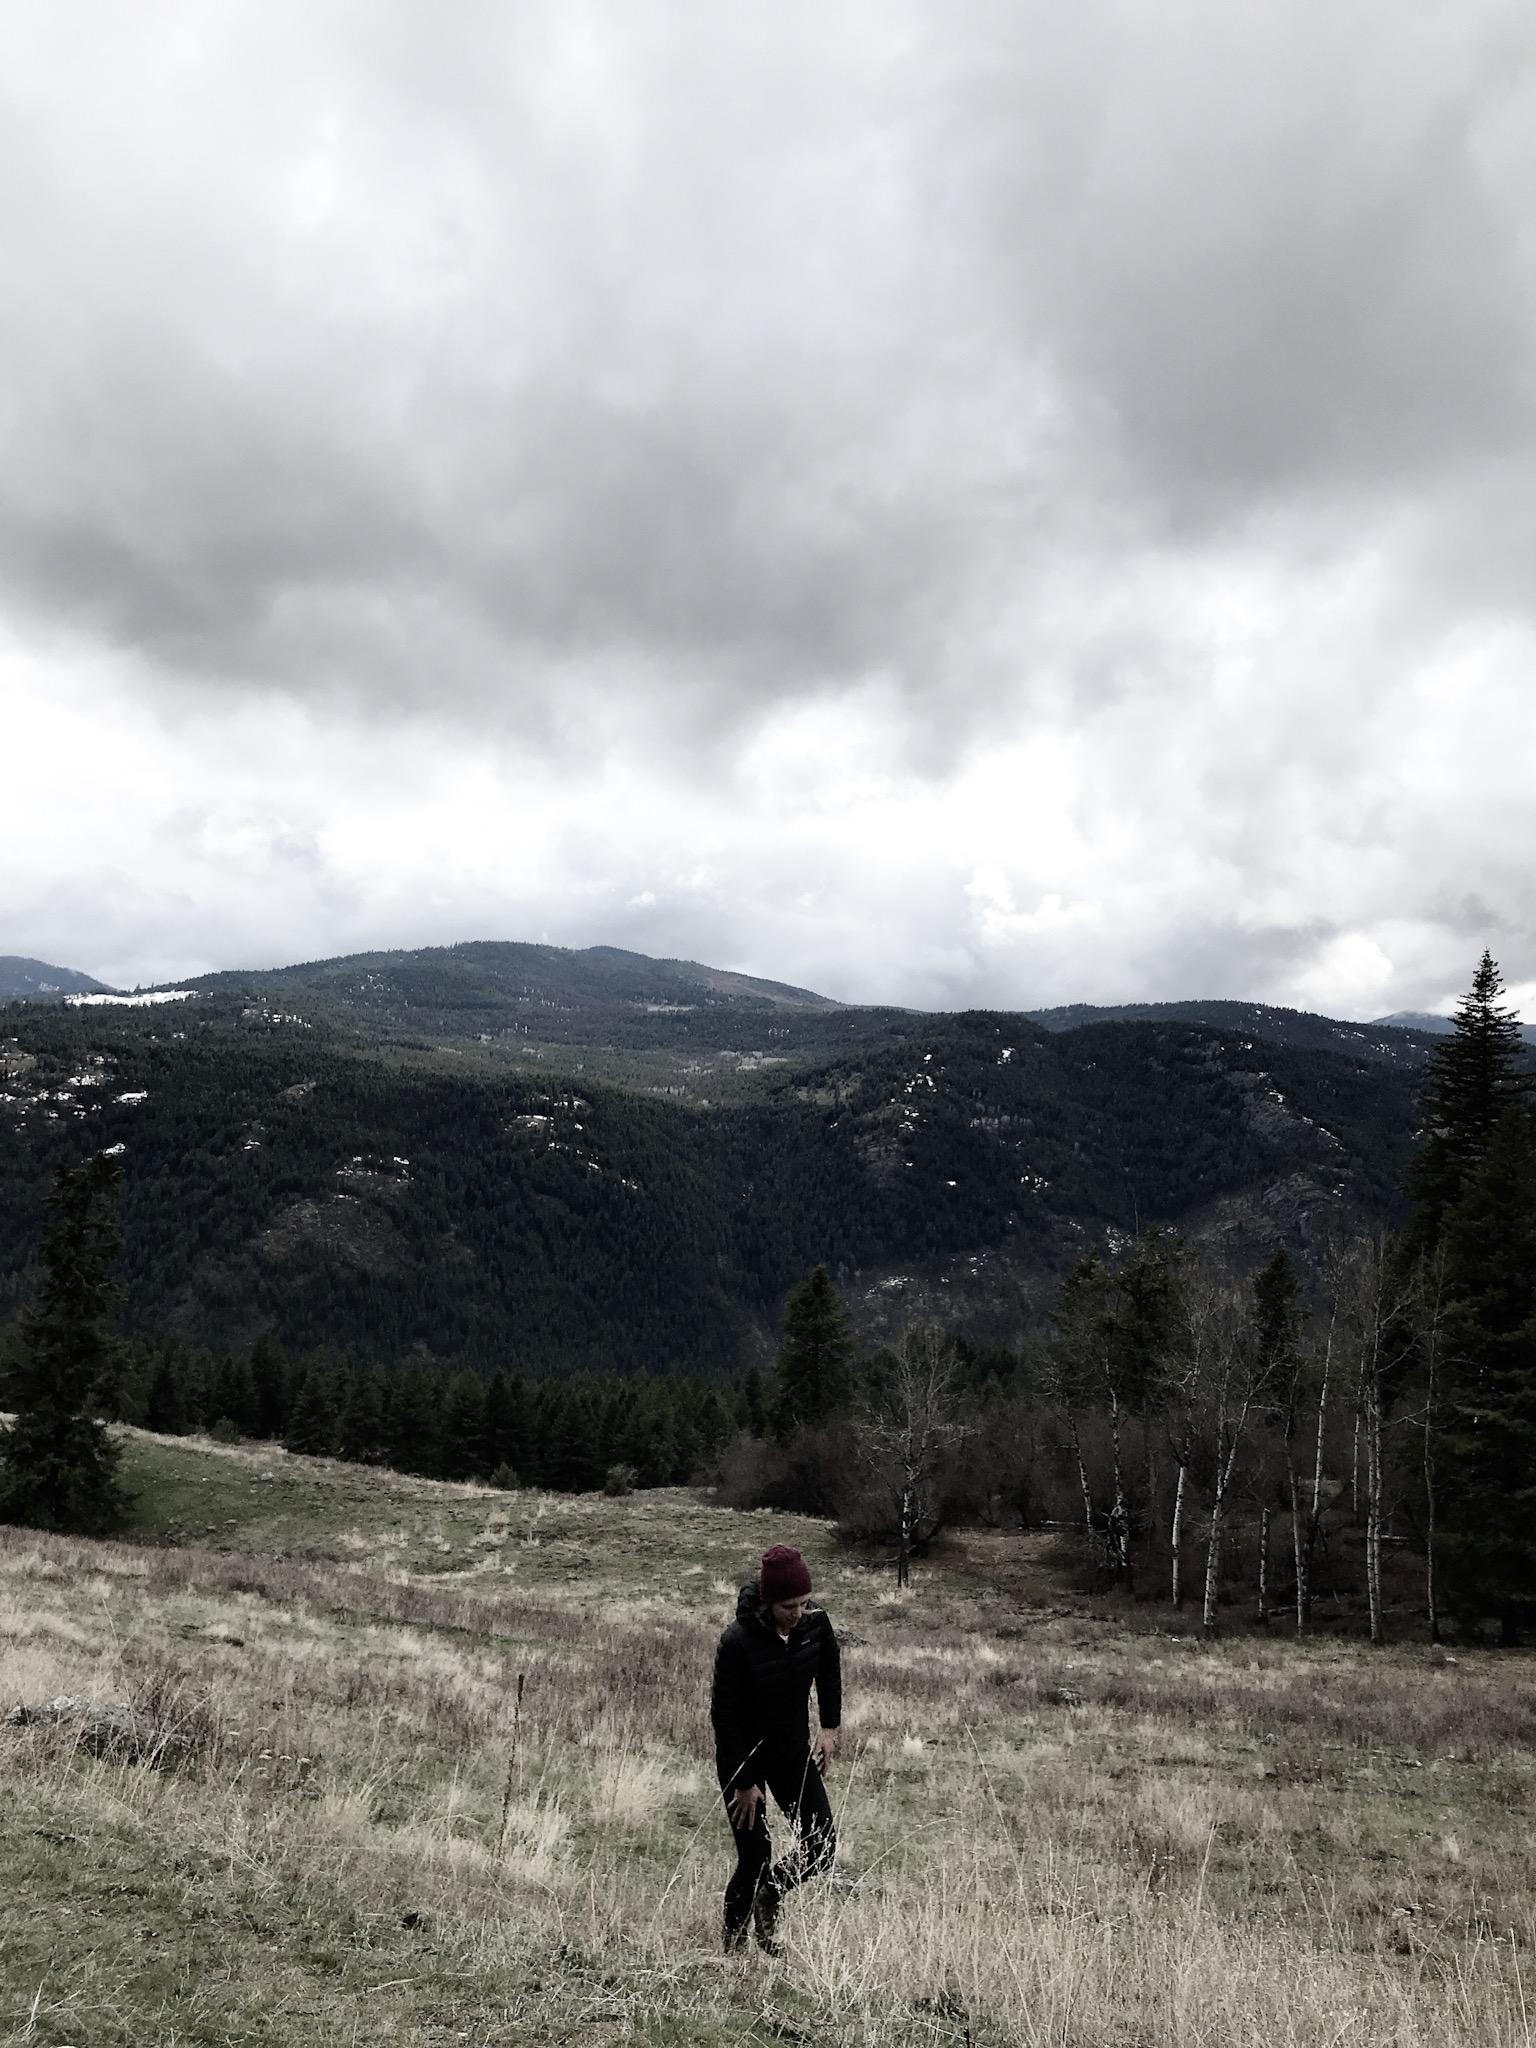 out on the land, x̌aʔx̌aʔ tum xúlaʔxʷ, Apr 2019